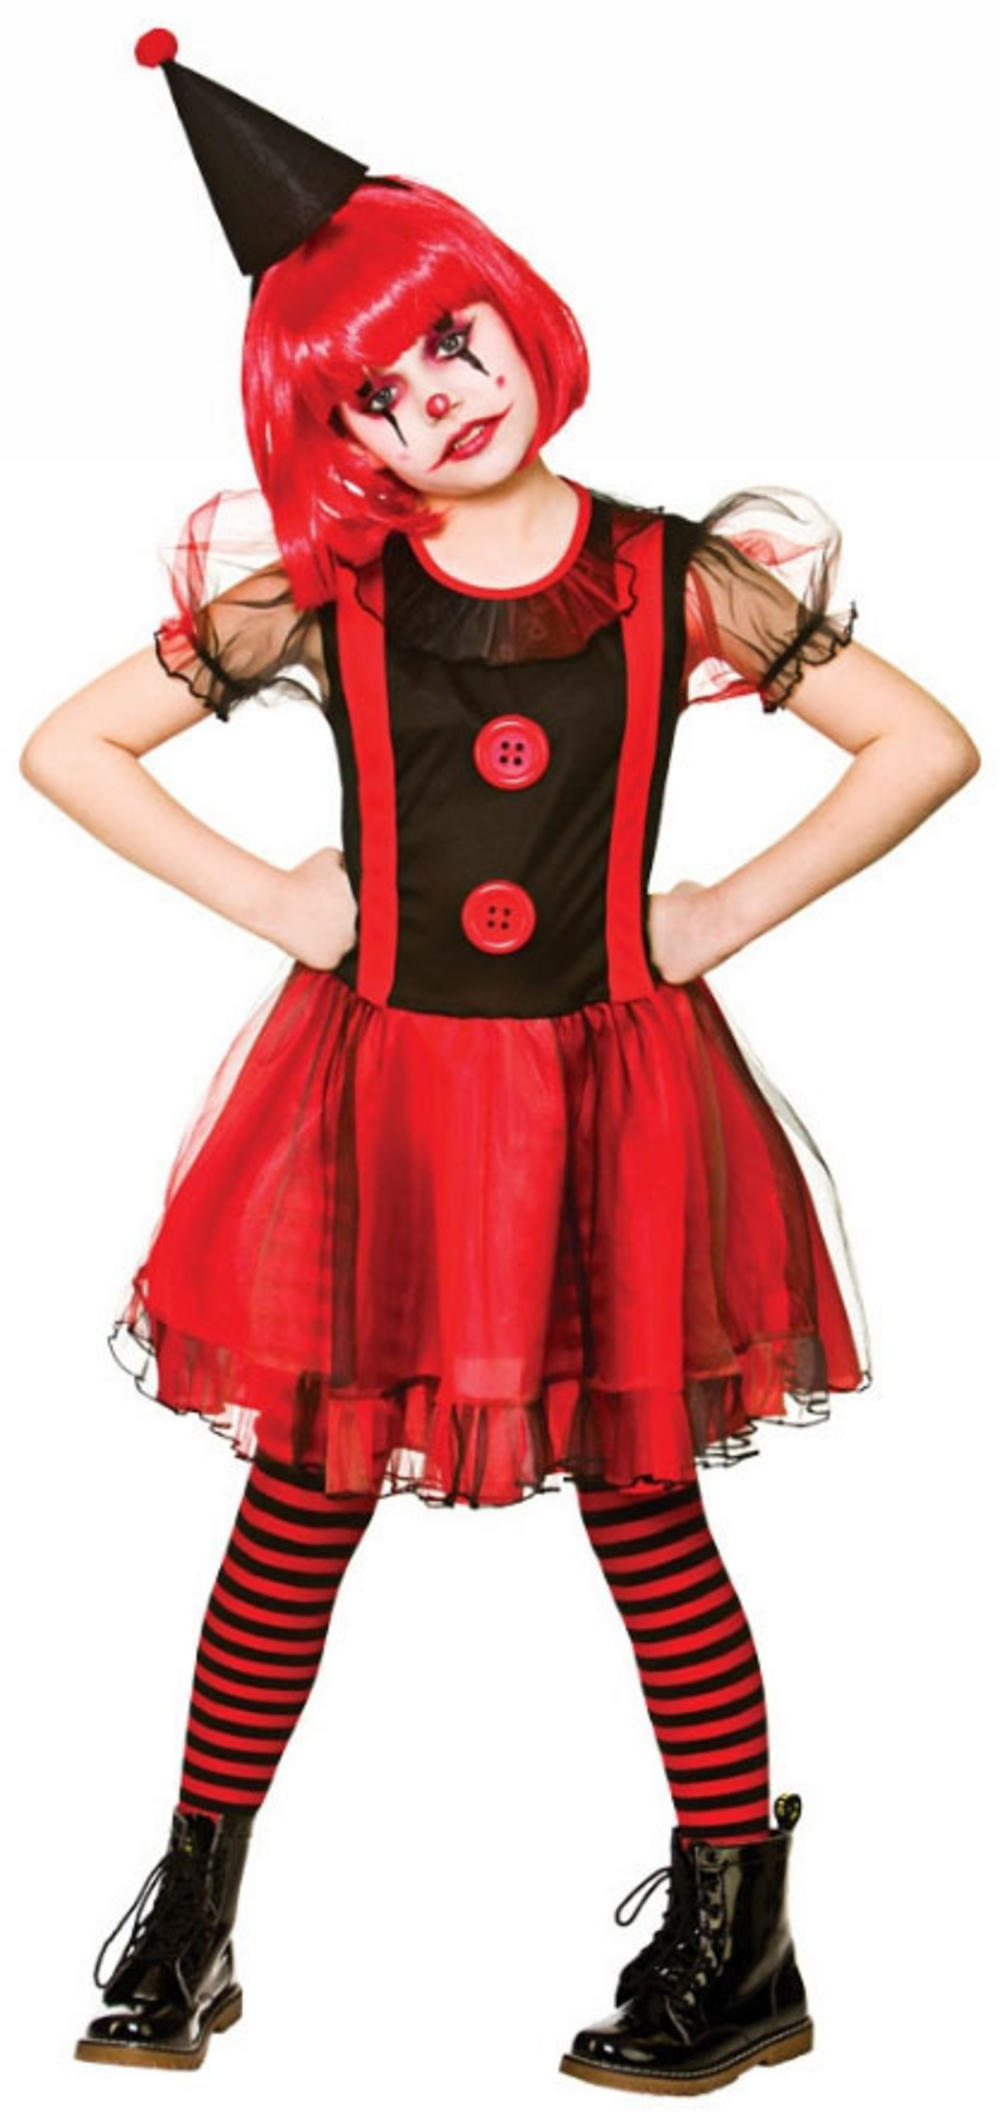 Freaky Clown Girls Costume